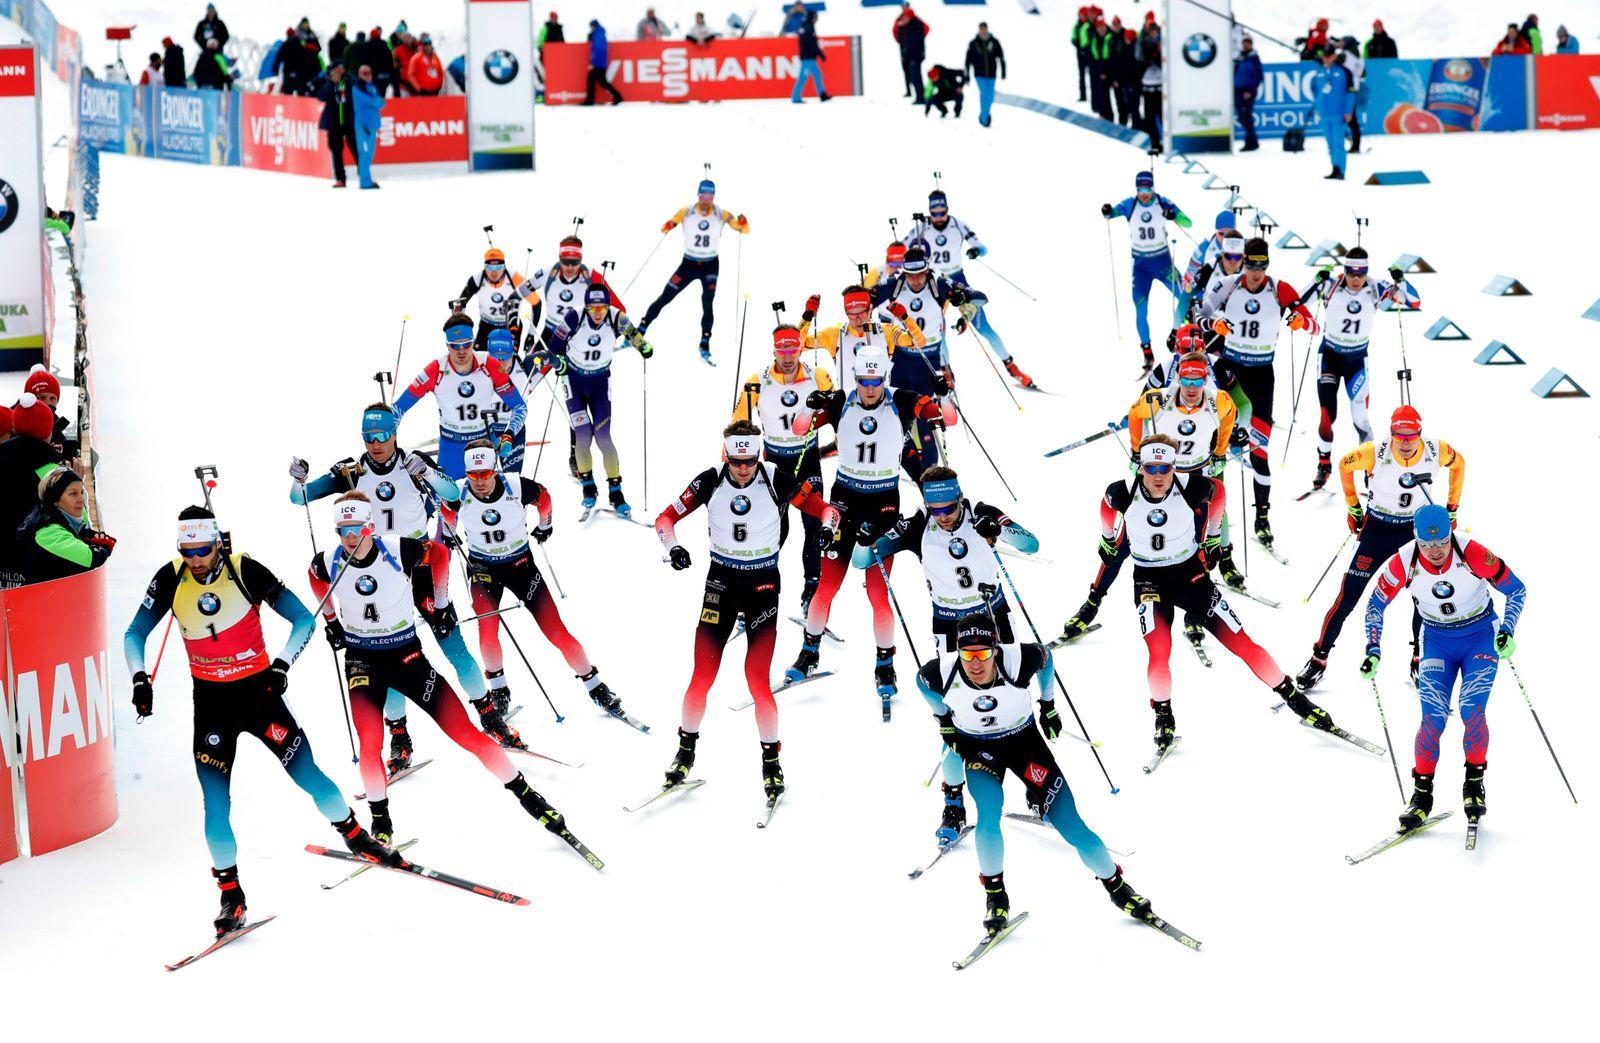 Men 15 km Mass start, Pokljuka, Slovenia - 26 Jan 2020